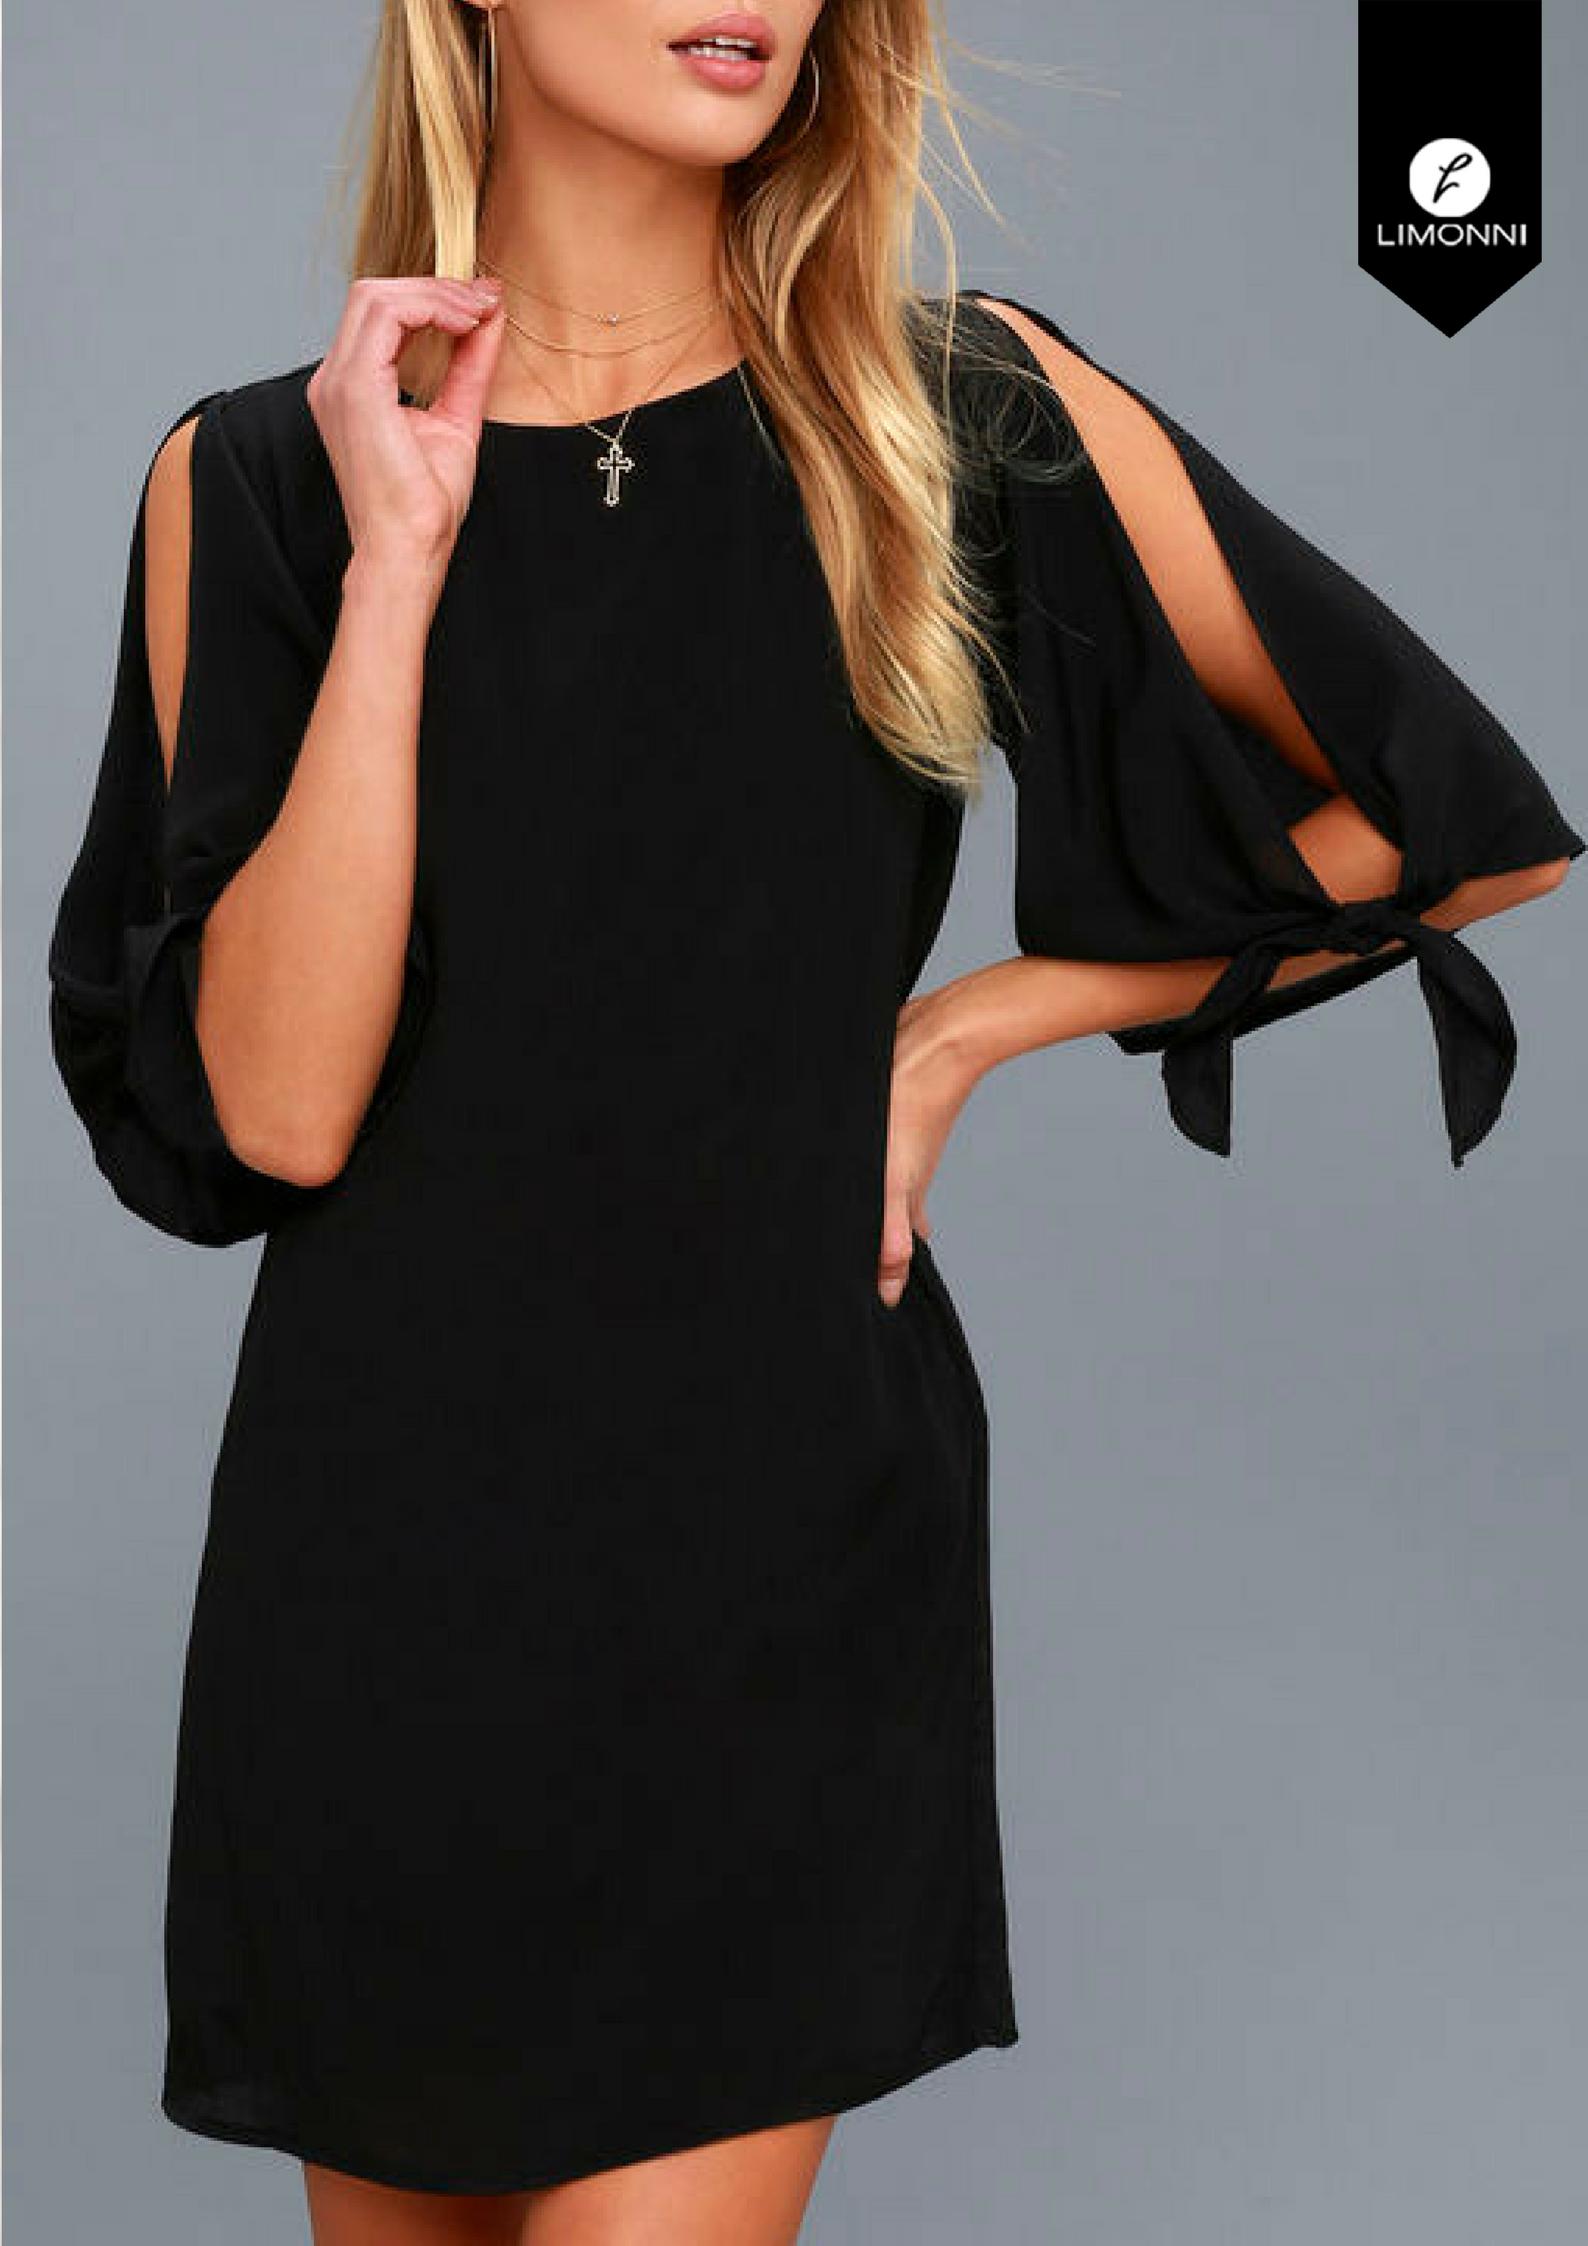 Vestidos para mujer Limonni Limonni LI1502 Cortos elegantes